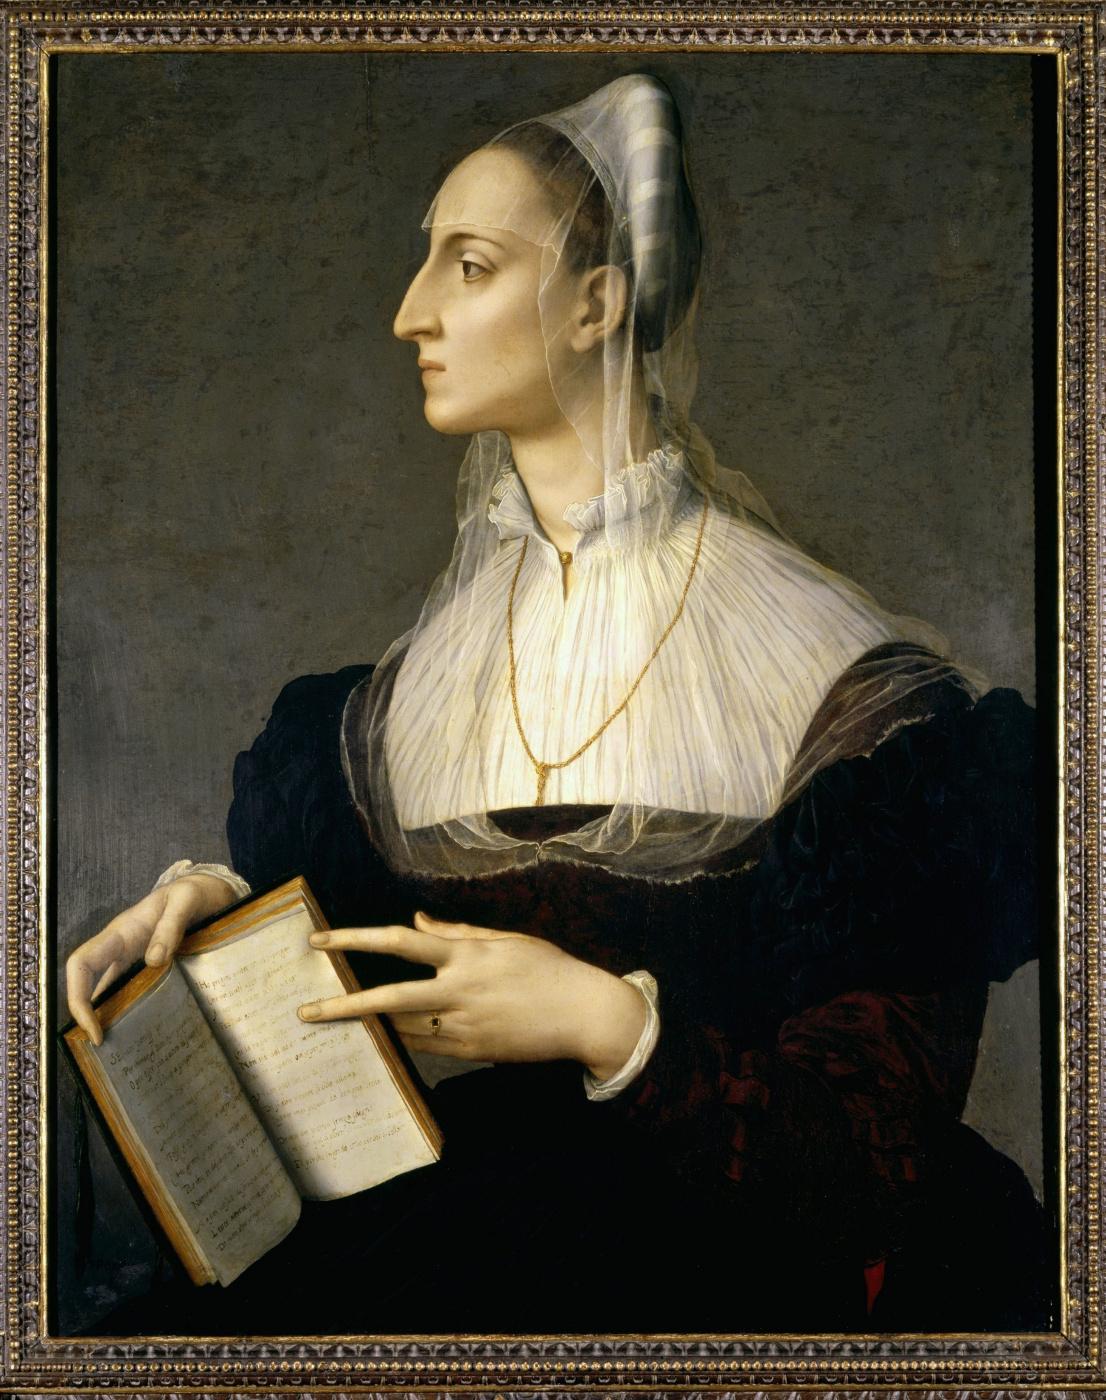 Agnolo Bronzino. Portrait of Laura Battiferri